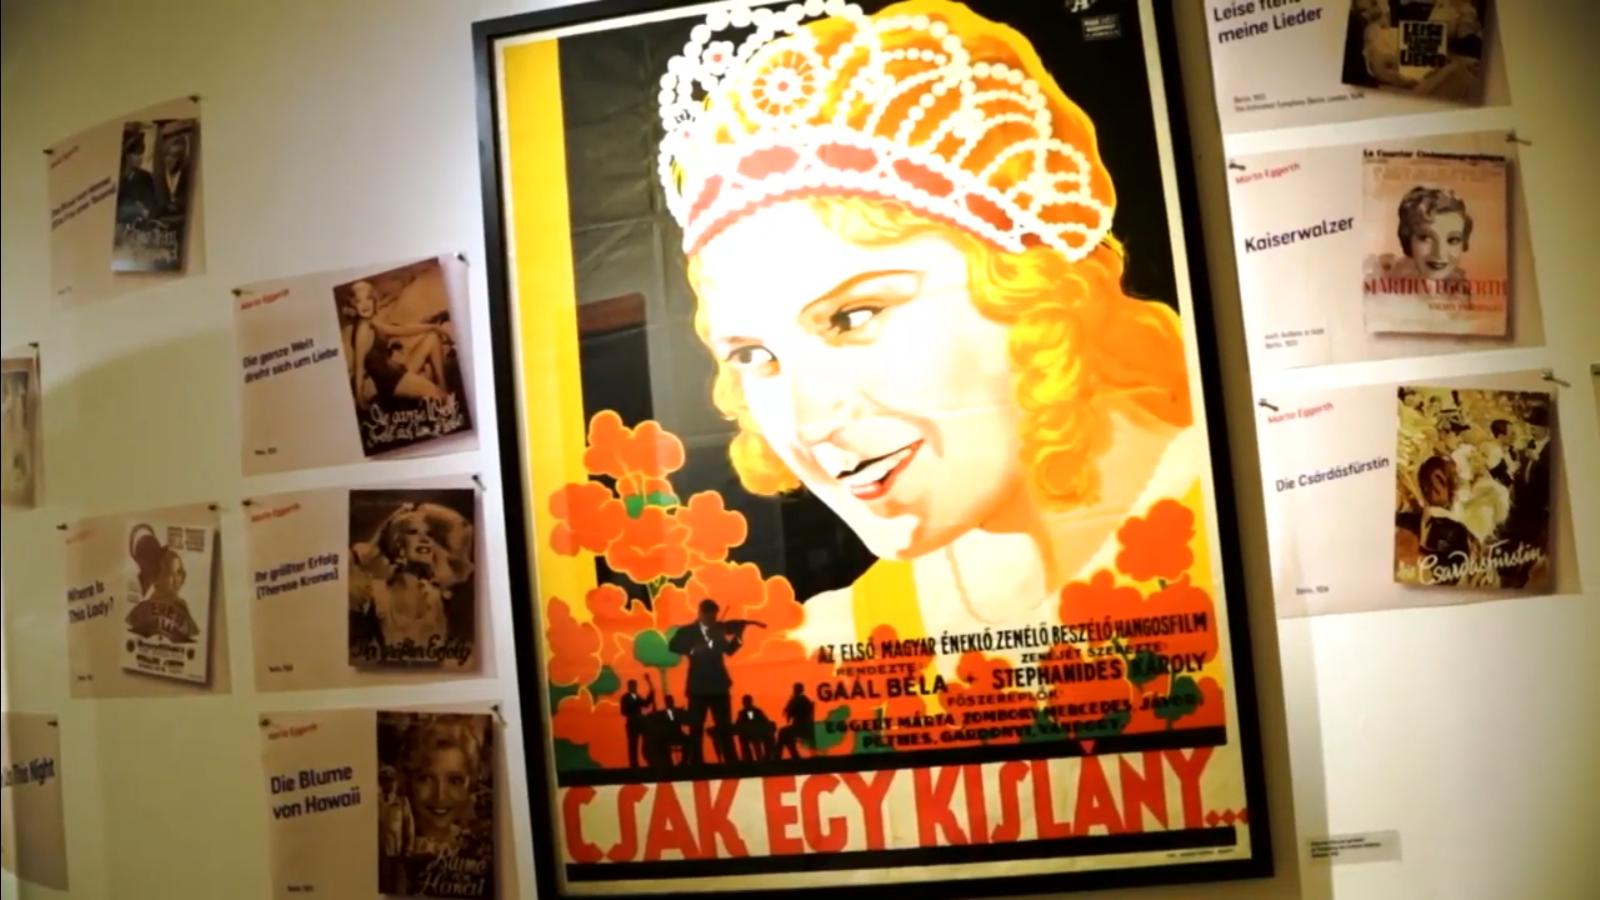 The new exhibition on Marta Eggerth and Jan Kiepura in Vienna. (Photo: Screenshot)